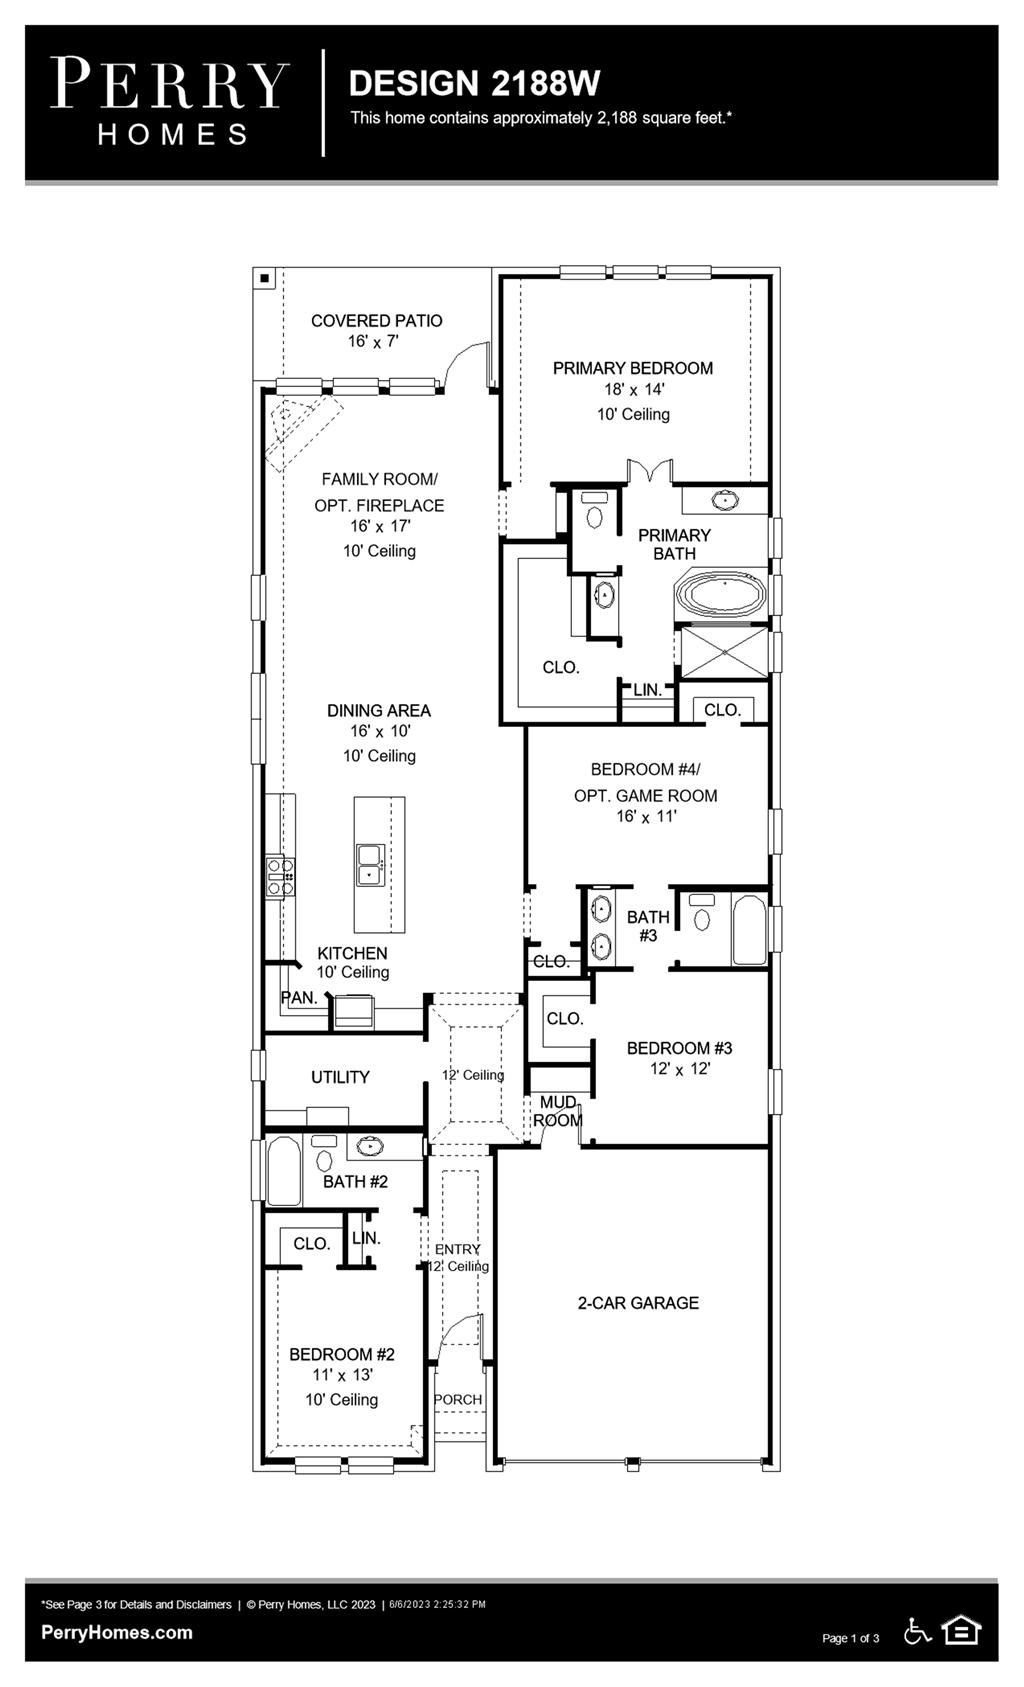 Floor Plan for 2188W